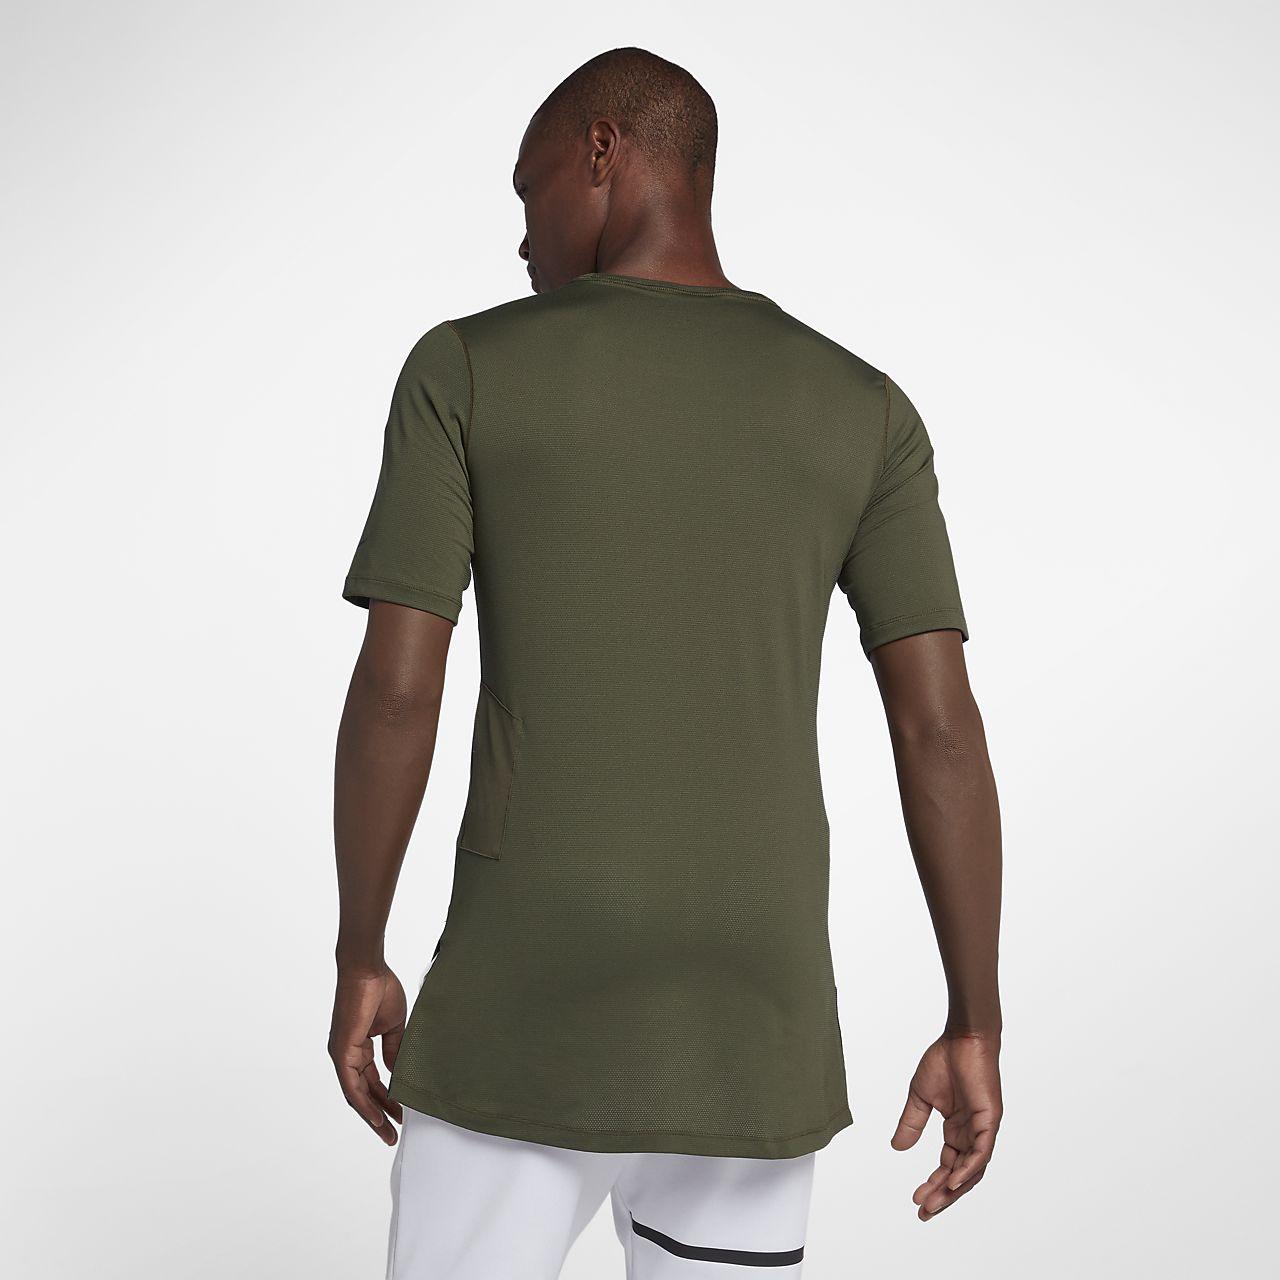 fde0505e46af6 Nike Dri-FIT Men s Utility Short-Sleeve Training Top. Nike.com GB